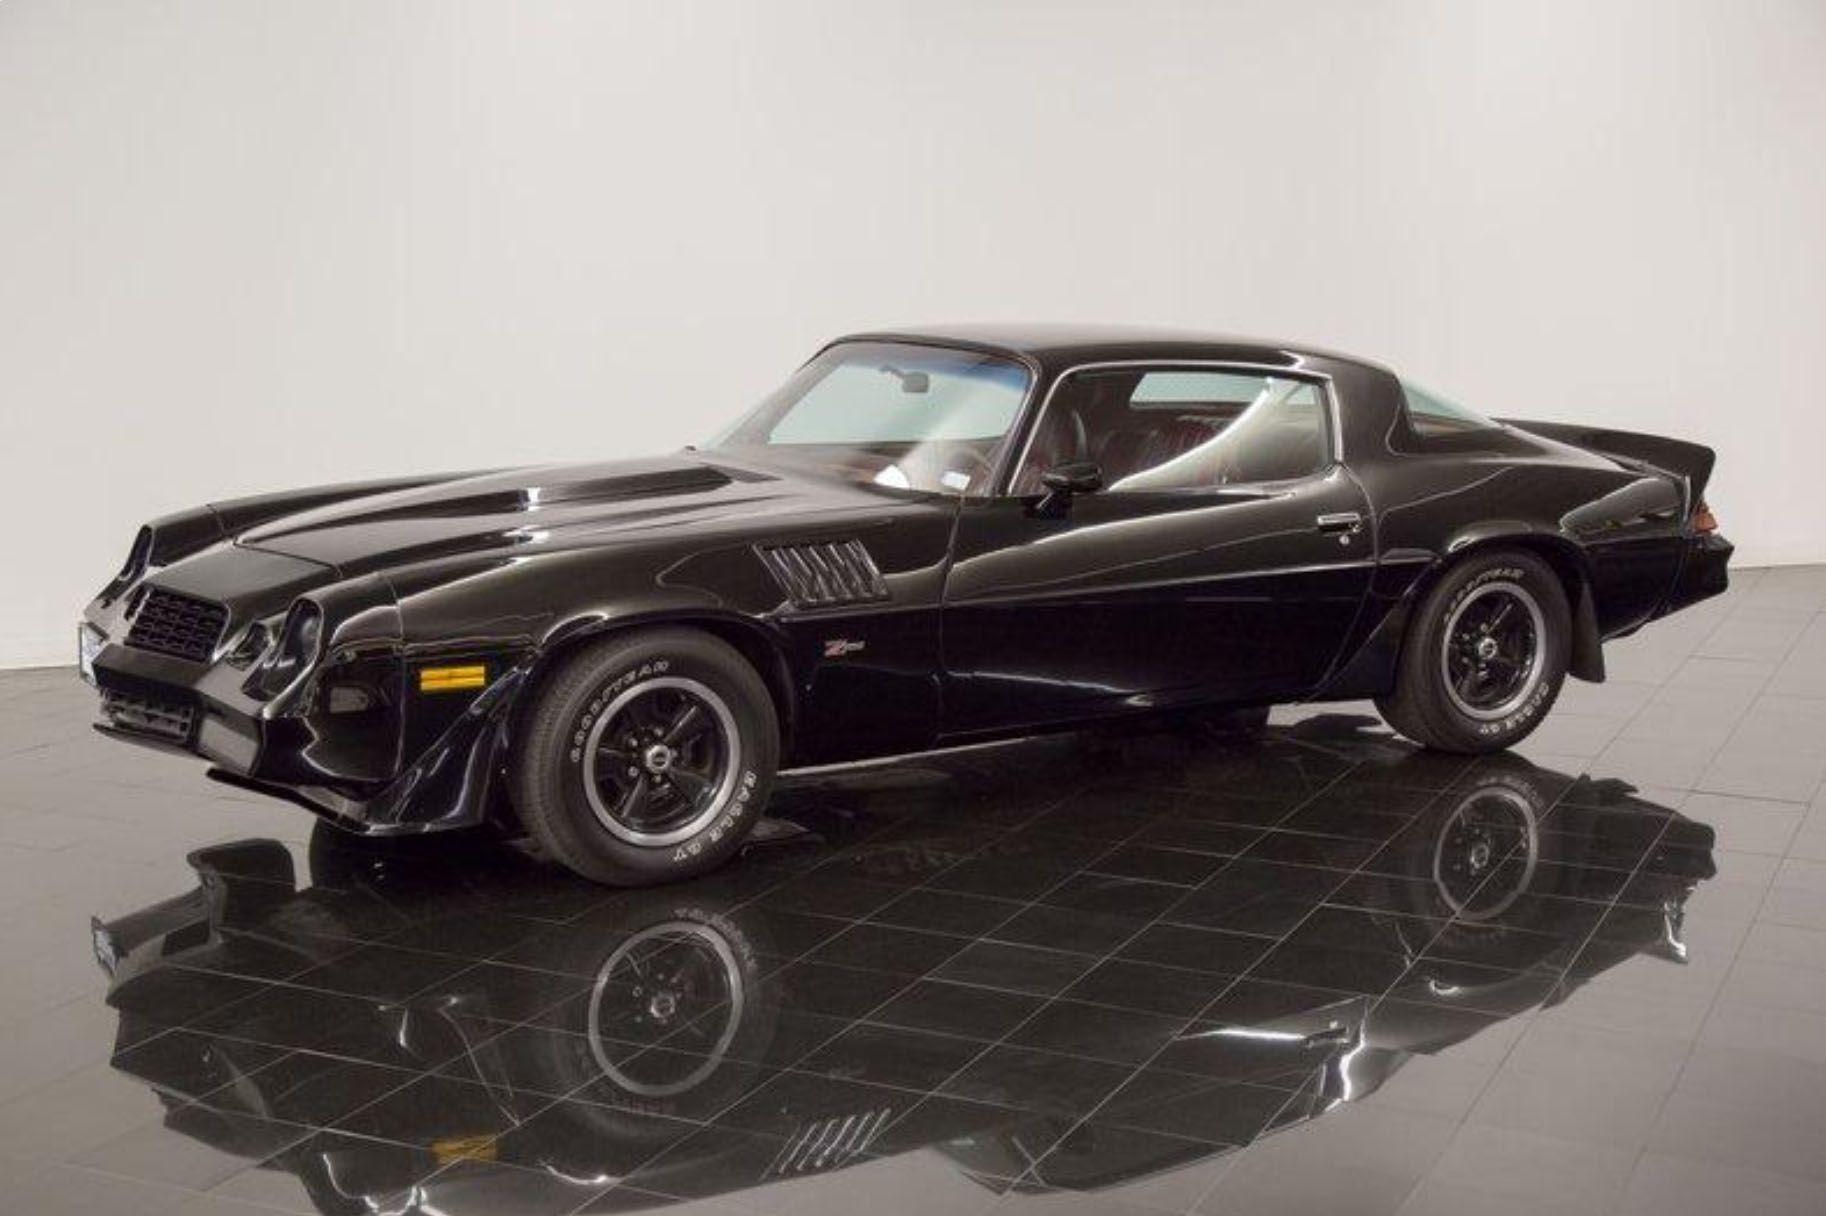 "<img src=""auction-1979-camaro-z28.jpg"" alt=""A stunning 1979 Chevrolet Camaro Z/28 coupe"">"